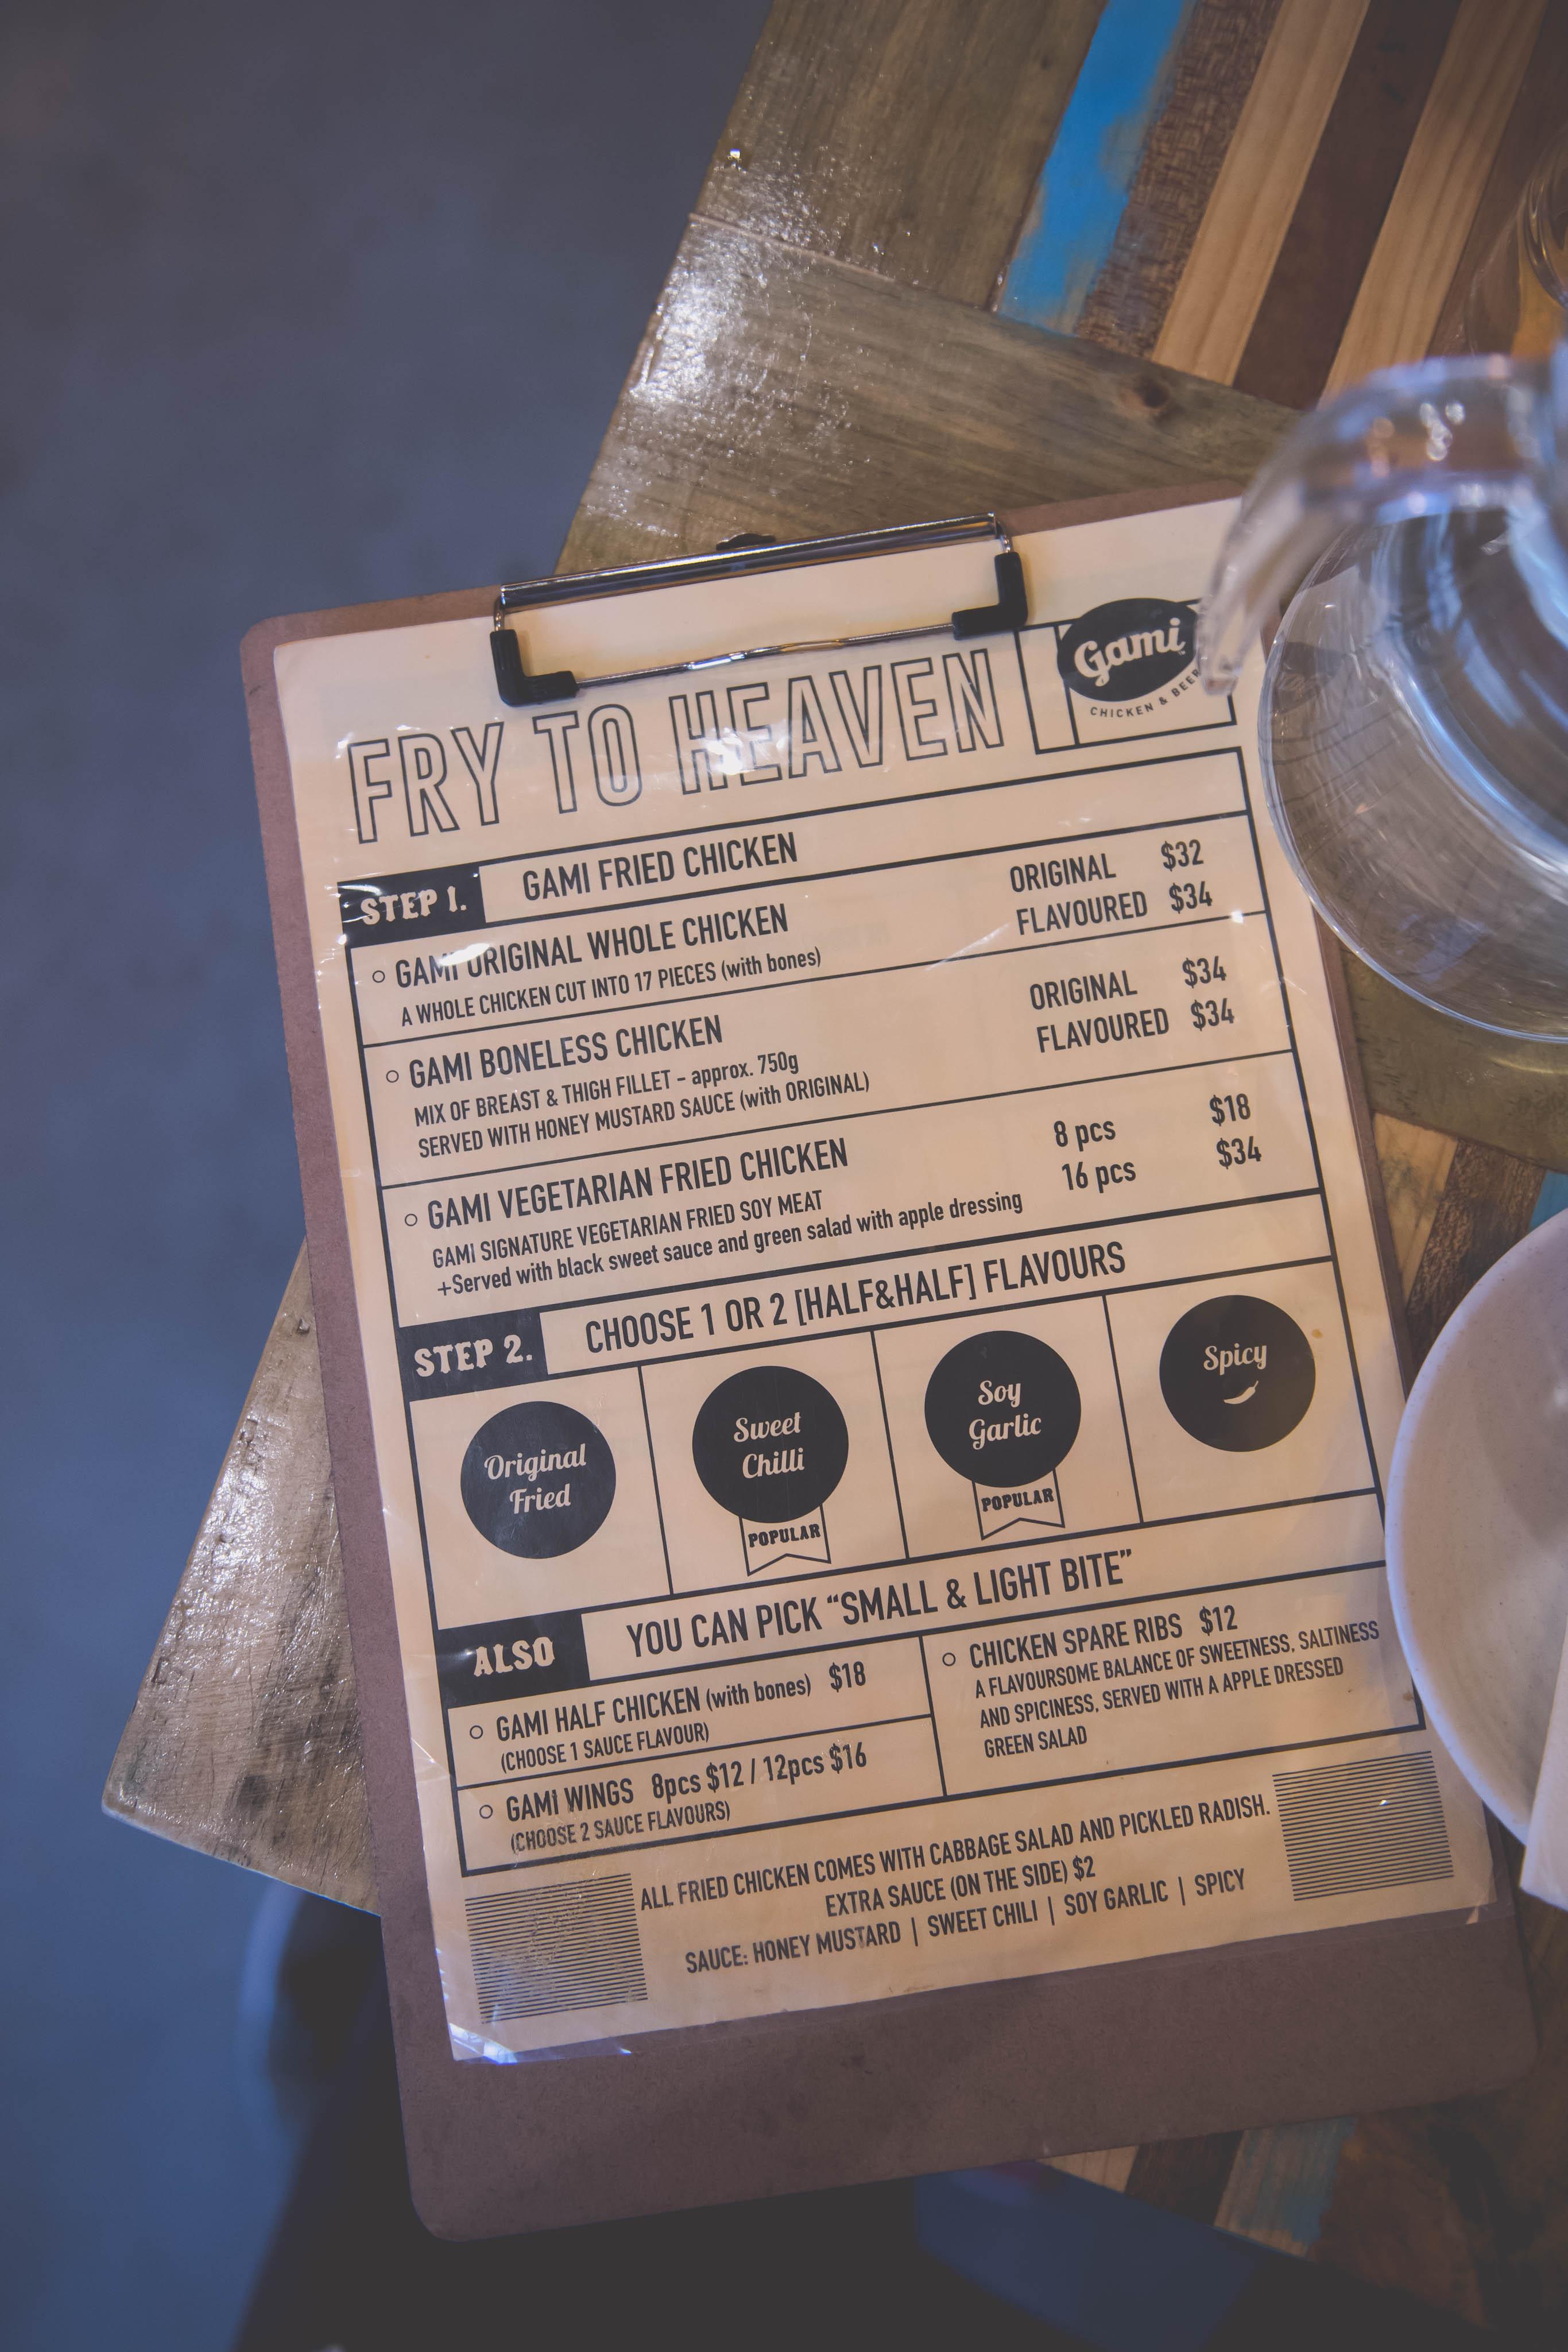 Gami chicken and beer menu